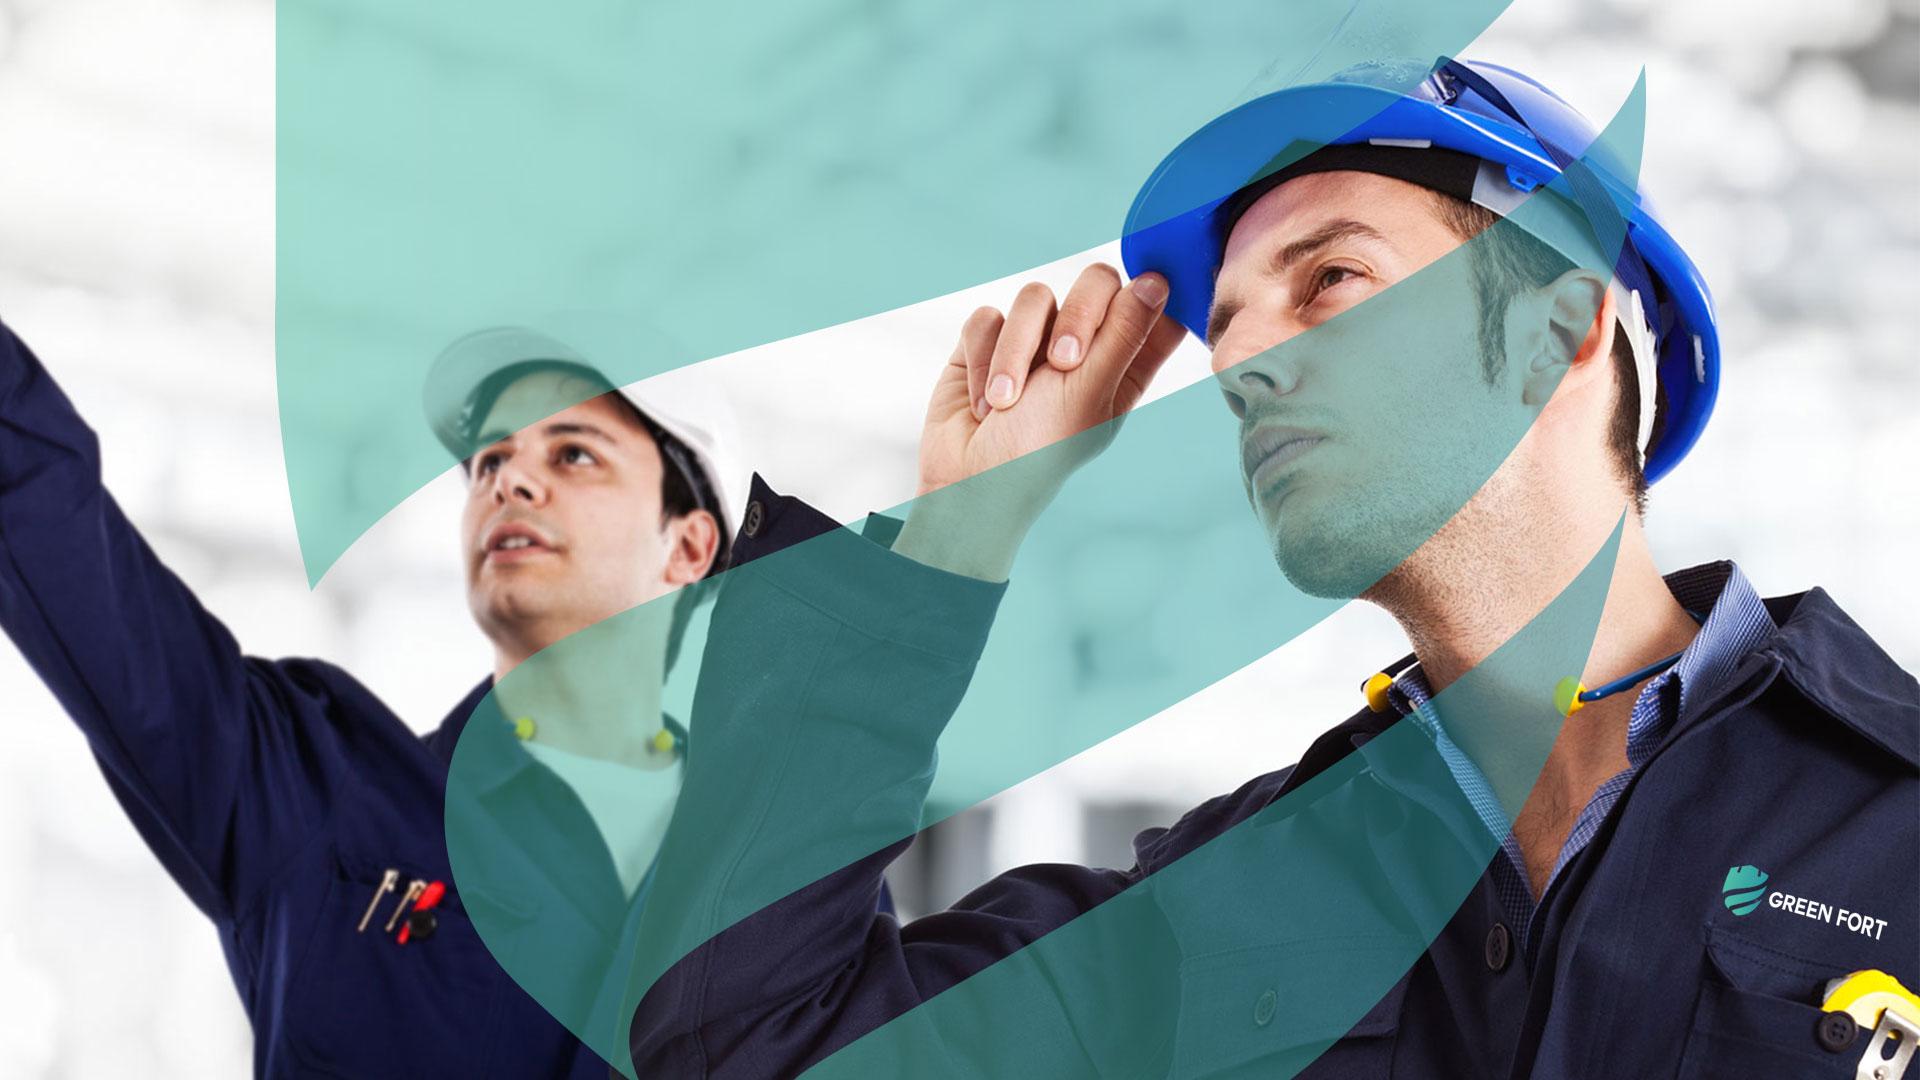 Green Fort Saudi Arabia Company Logo Design Presentation